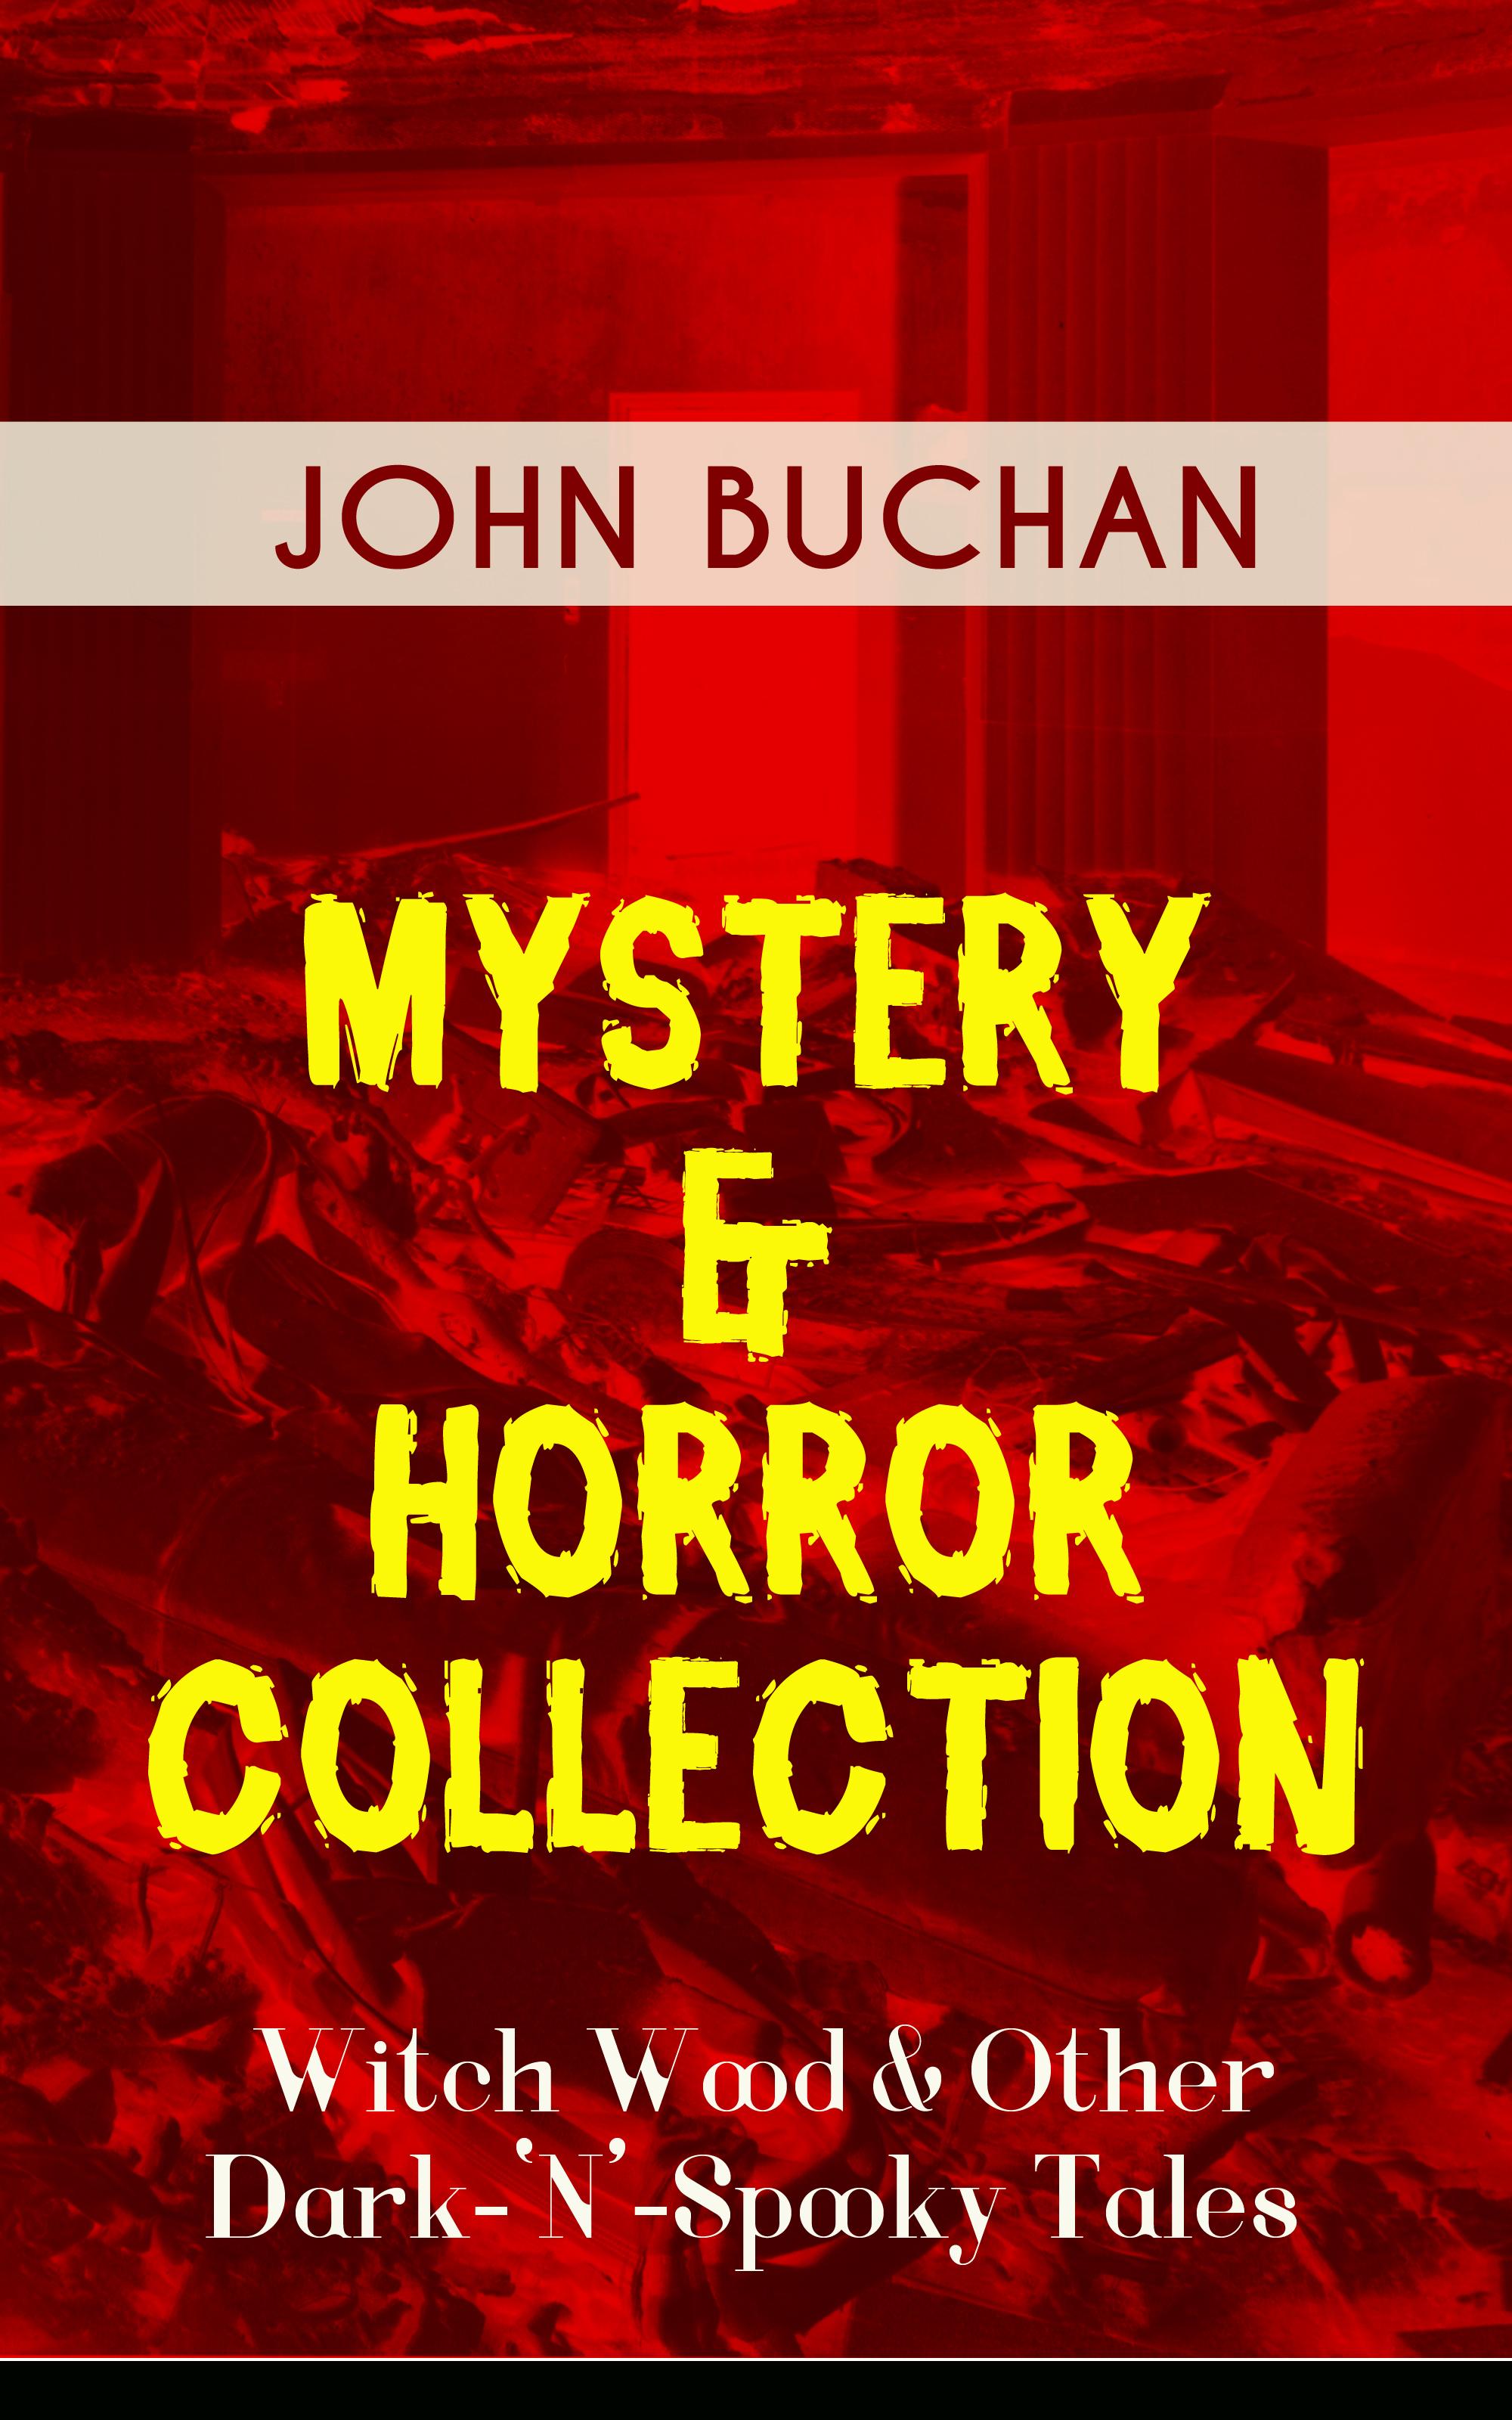 лучшая цена Buchan John MYSTERY & HORROR COLLECTION – Witch Wood & Other Dark-'N'-Spooky Tales